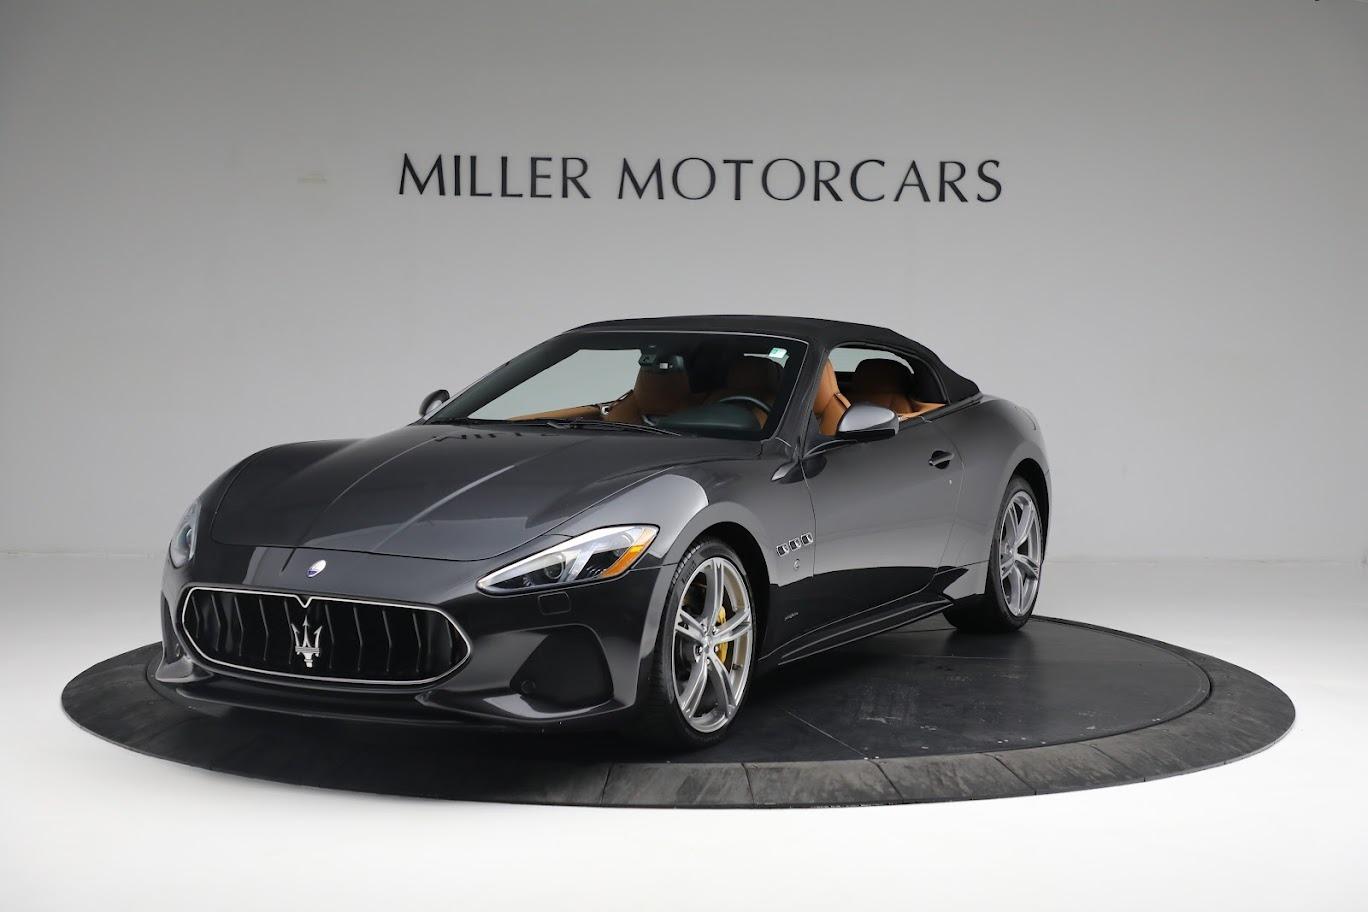 New 2019 Maserati GranTurismo Sport Convertible for sale $164,075 at McLaren Greenwich in Greenwich CT 06830 1